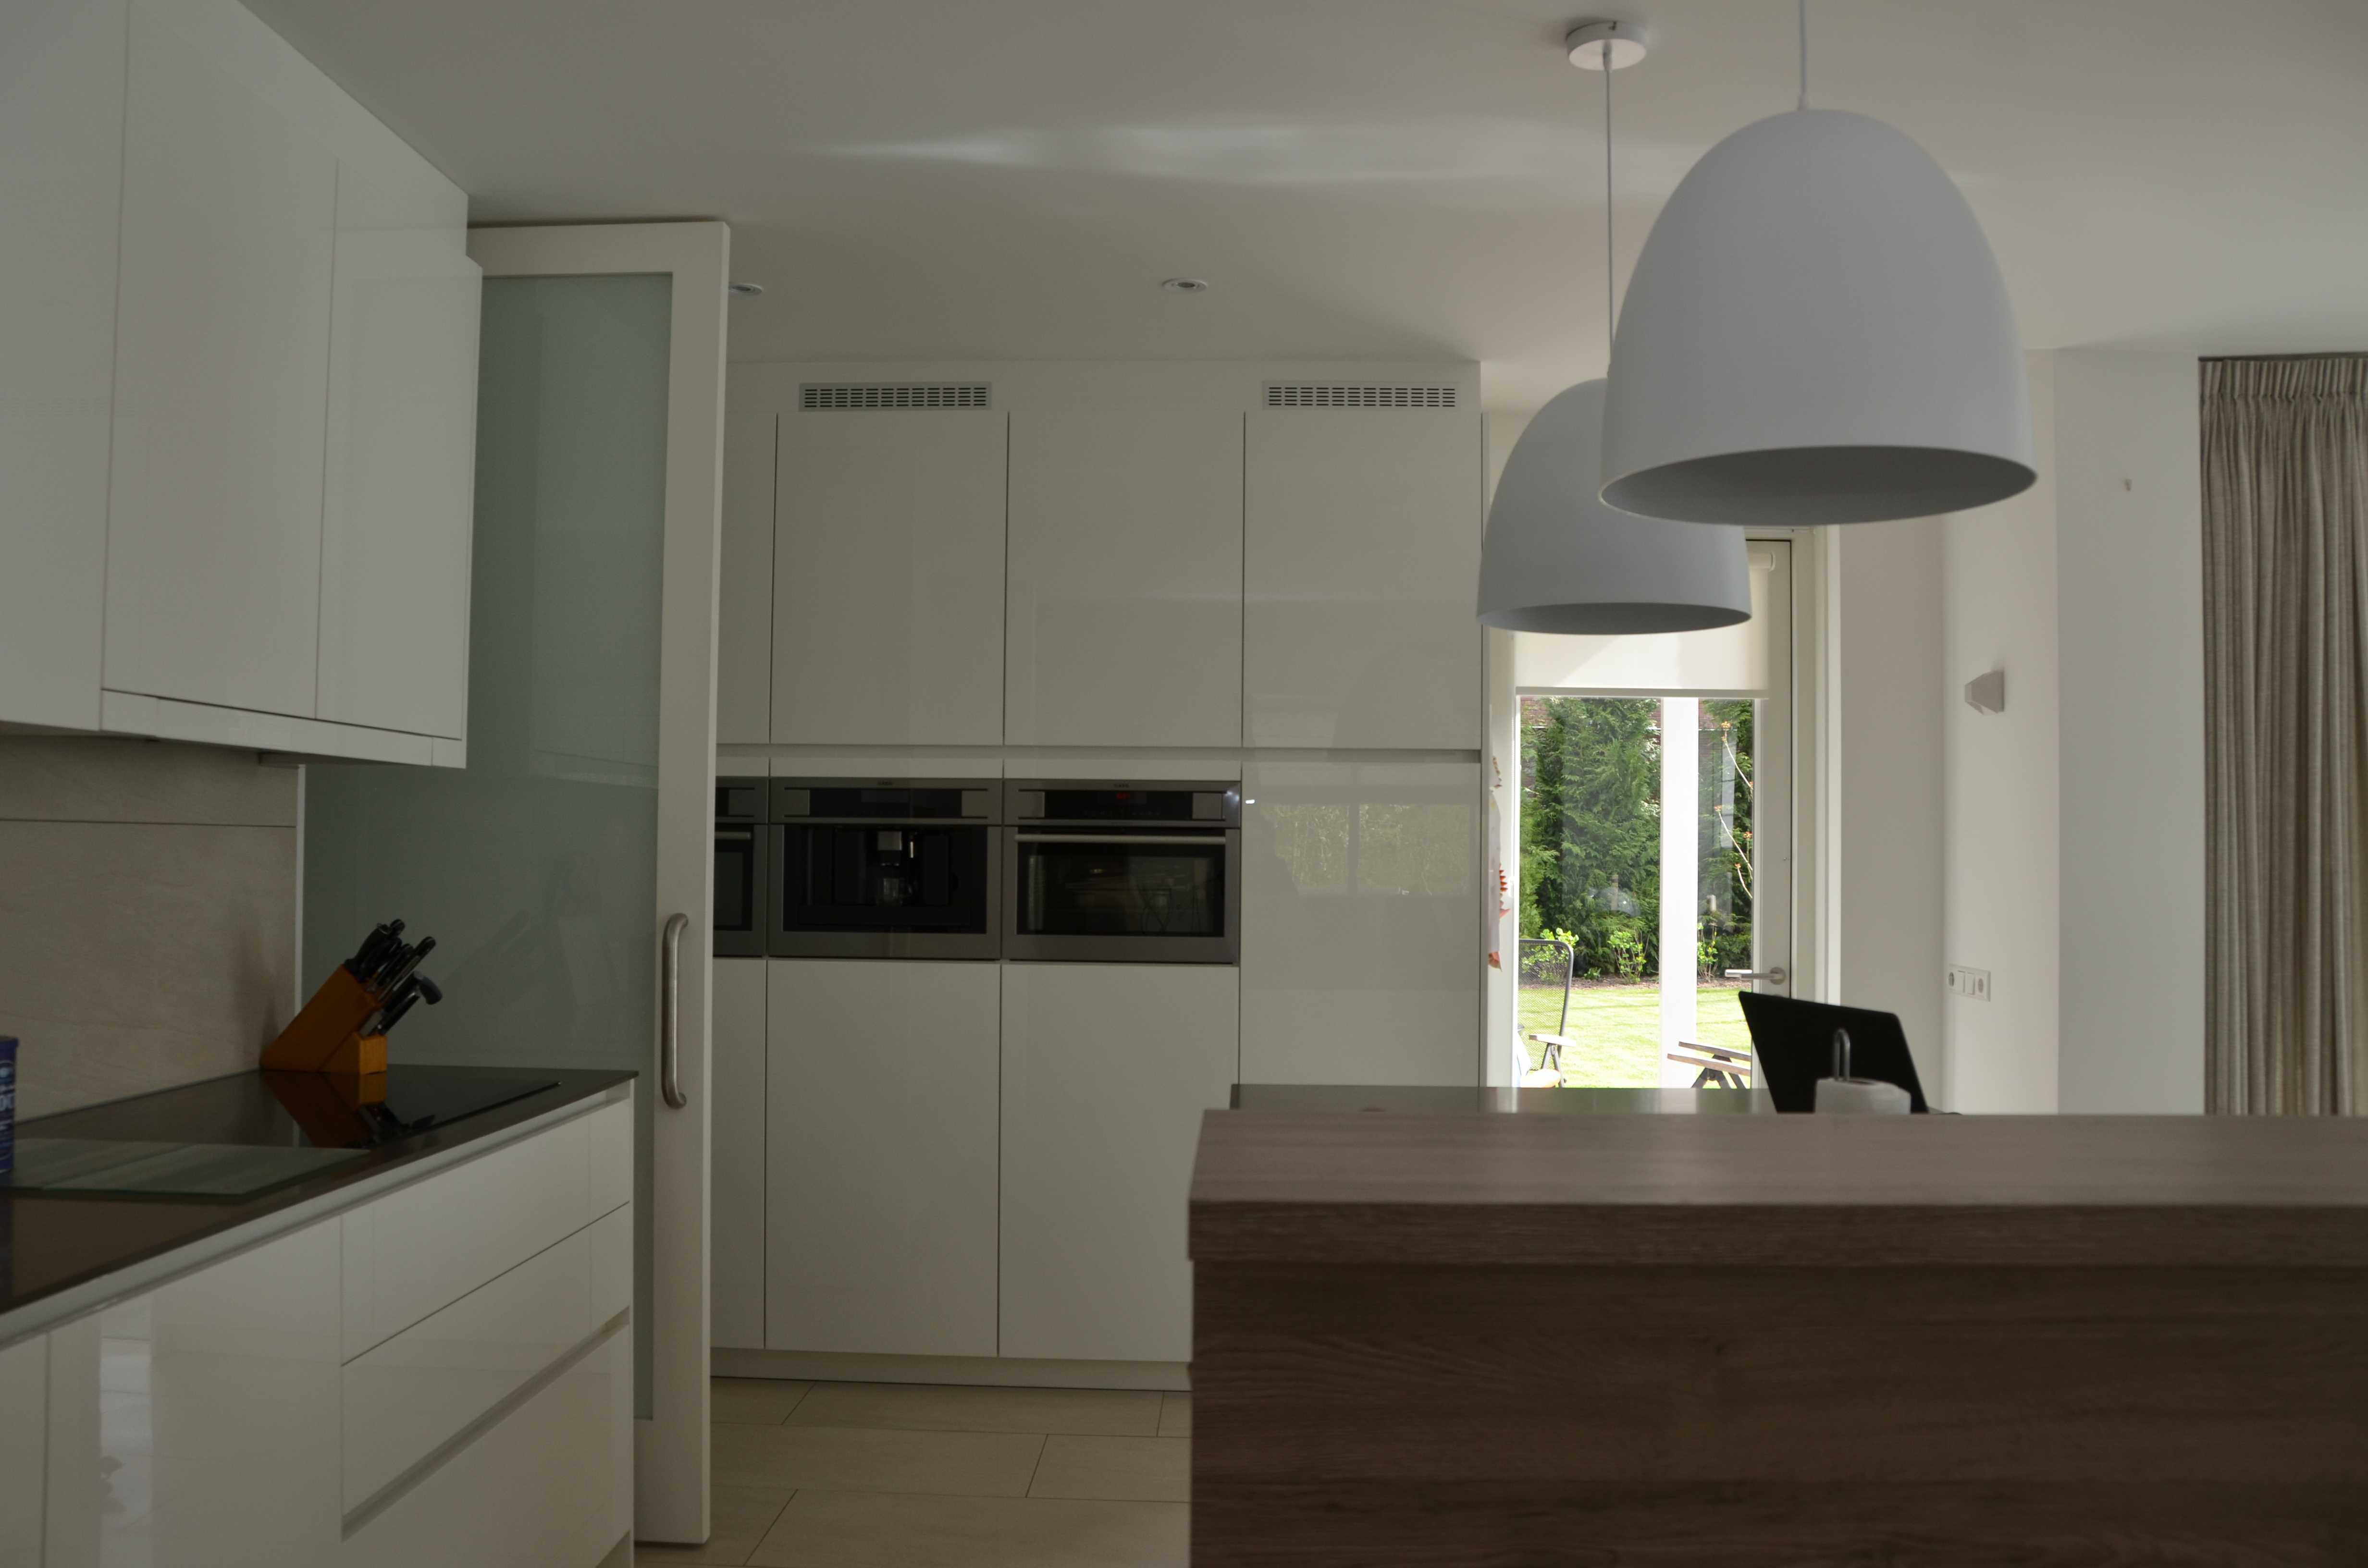 Nieuwbouw woning – Architectenbureau Drijvers Oisterwijk B.V.